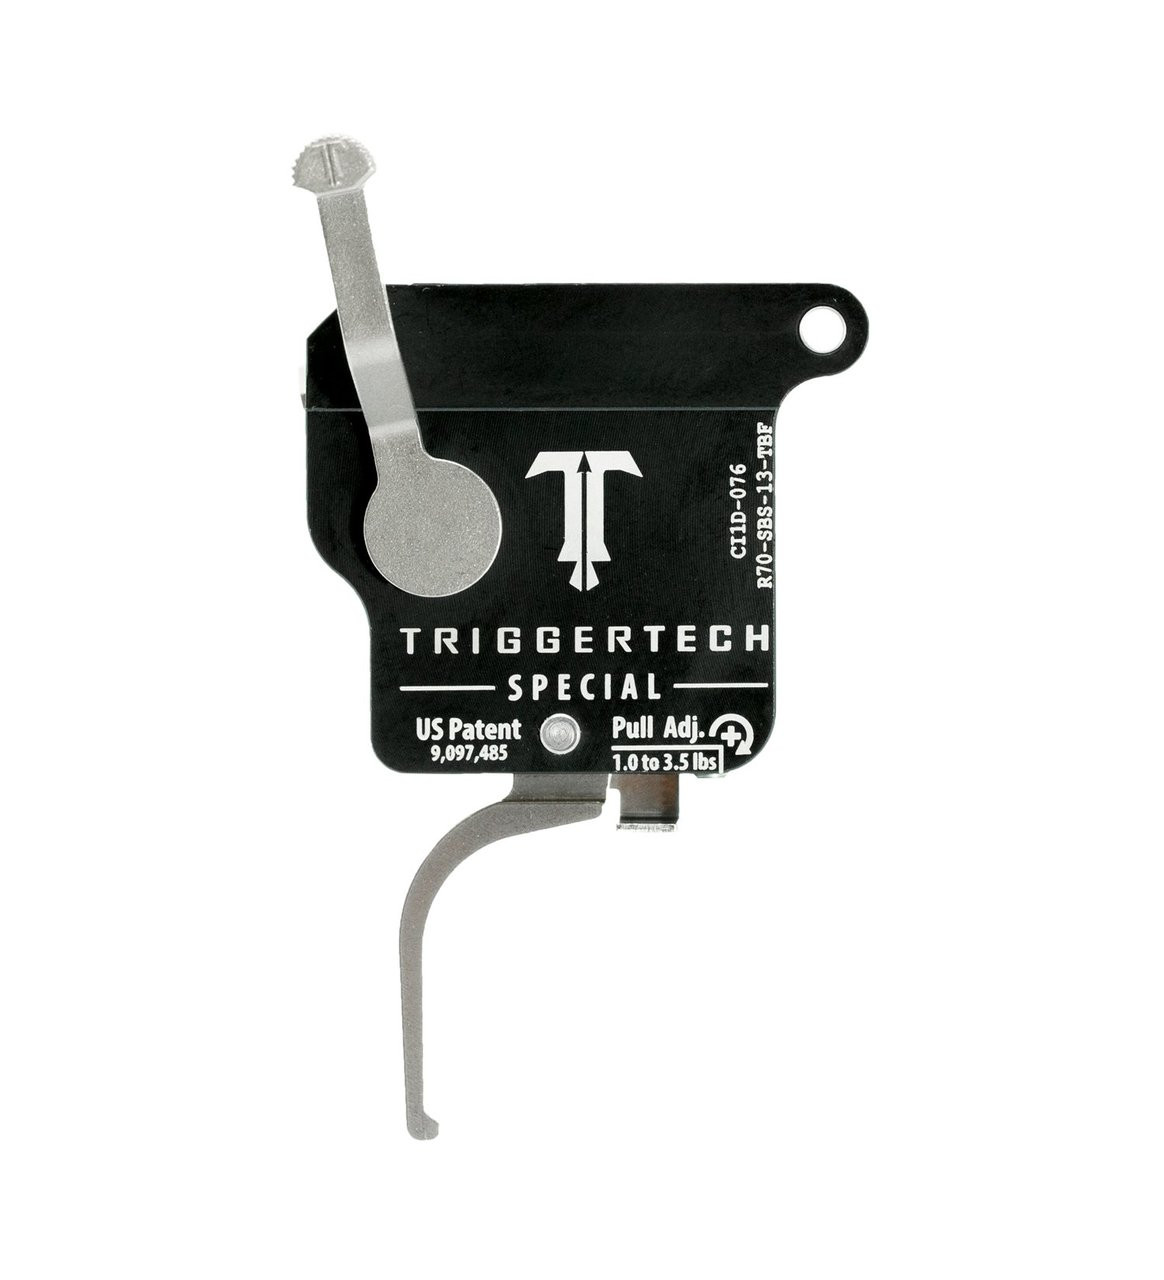 TriggerTech Remington 700 Special Trigger